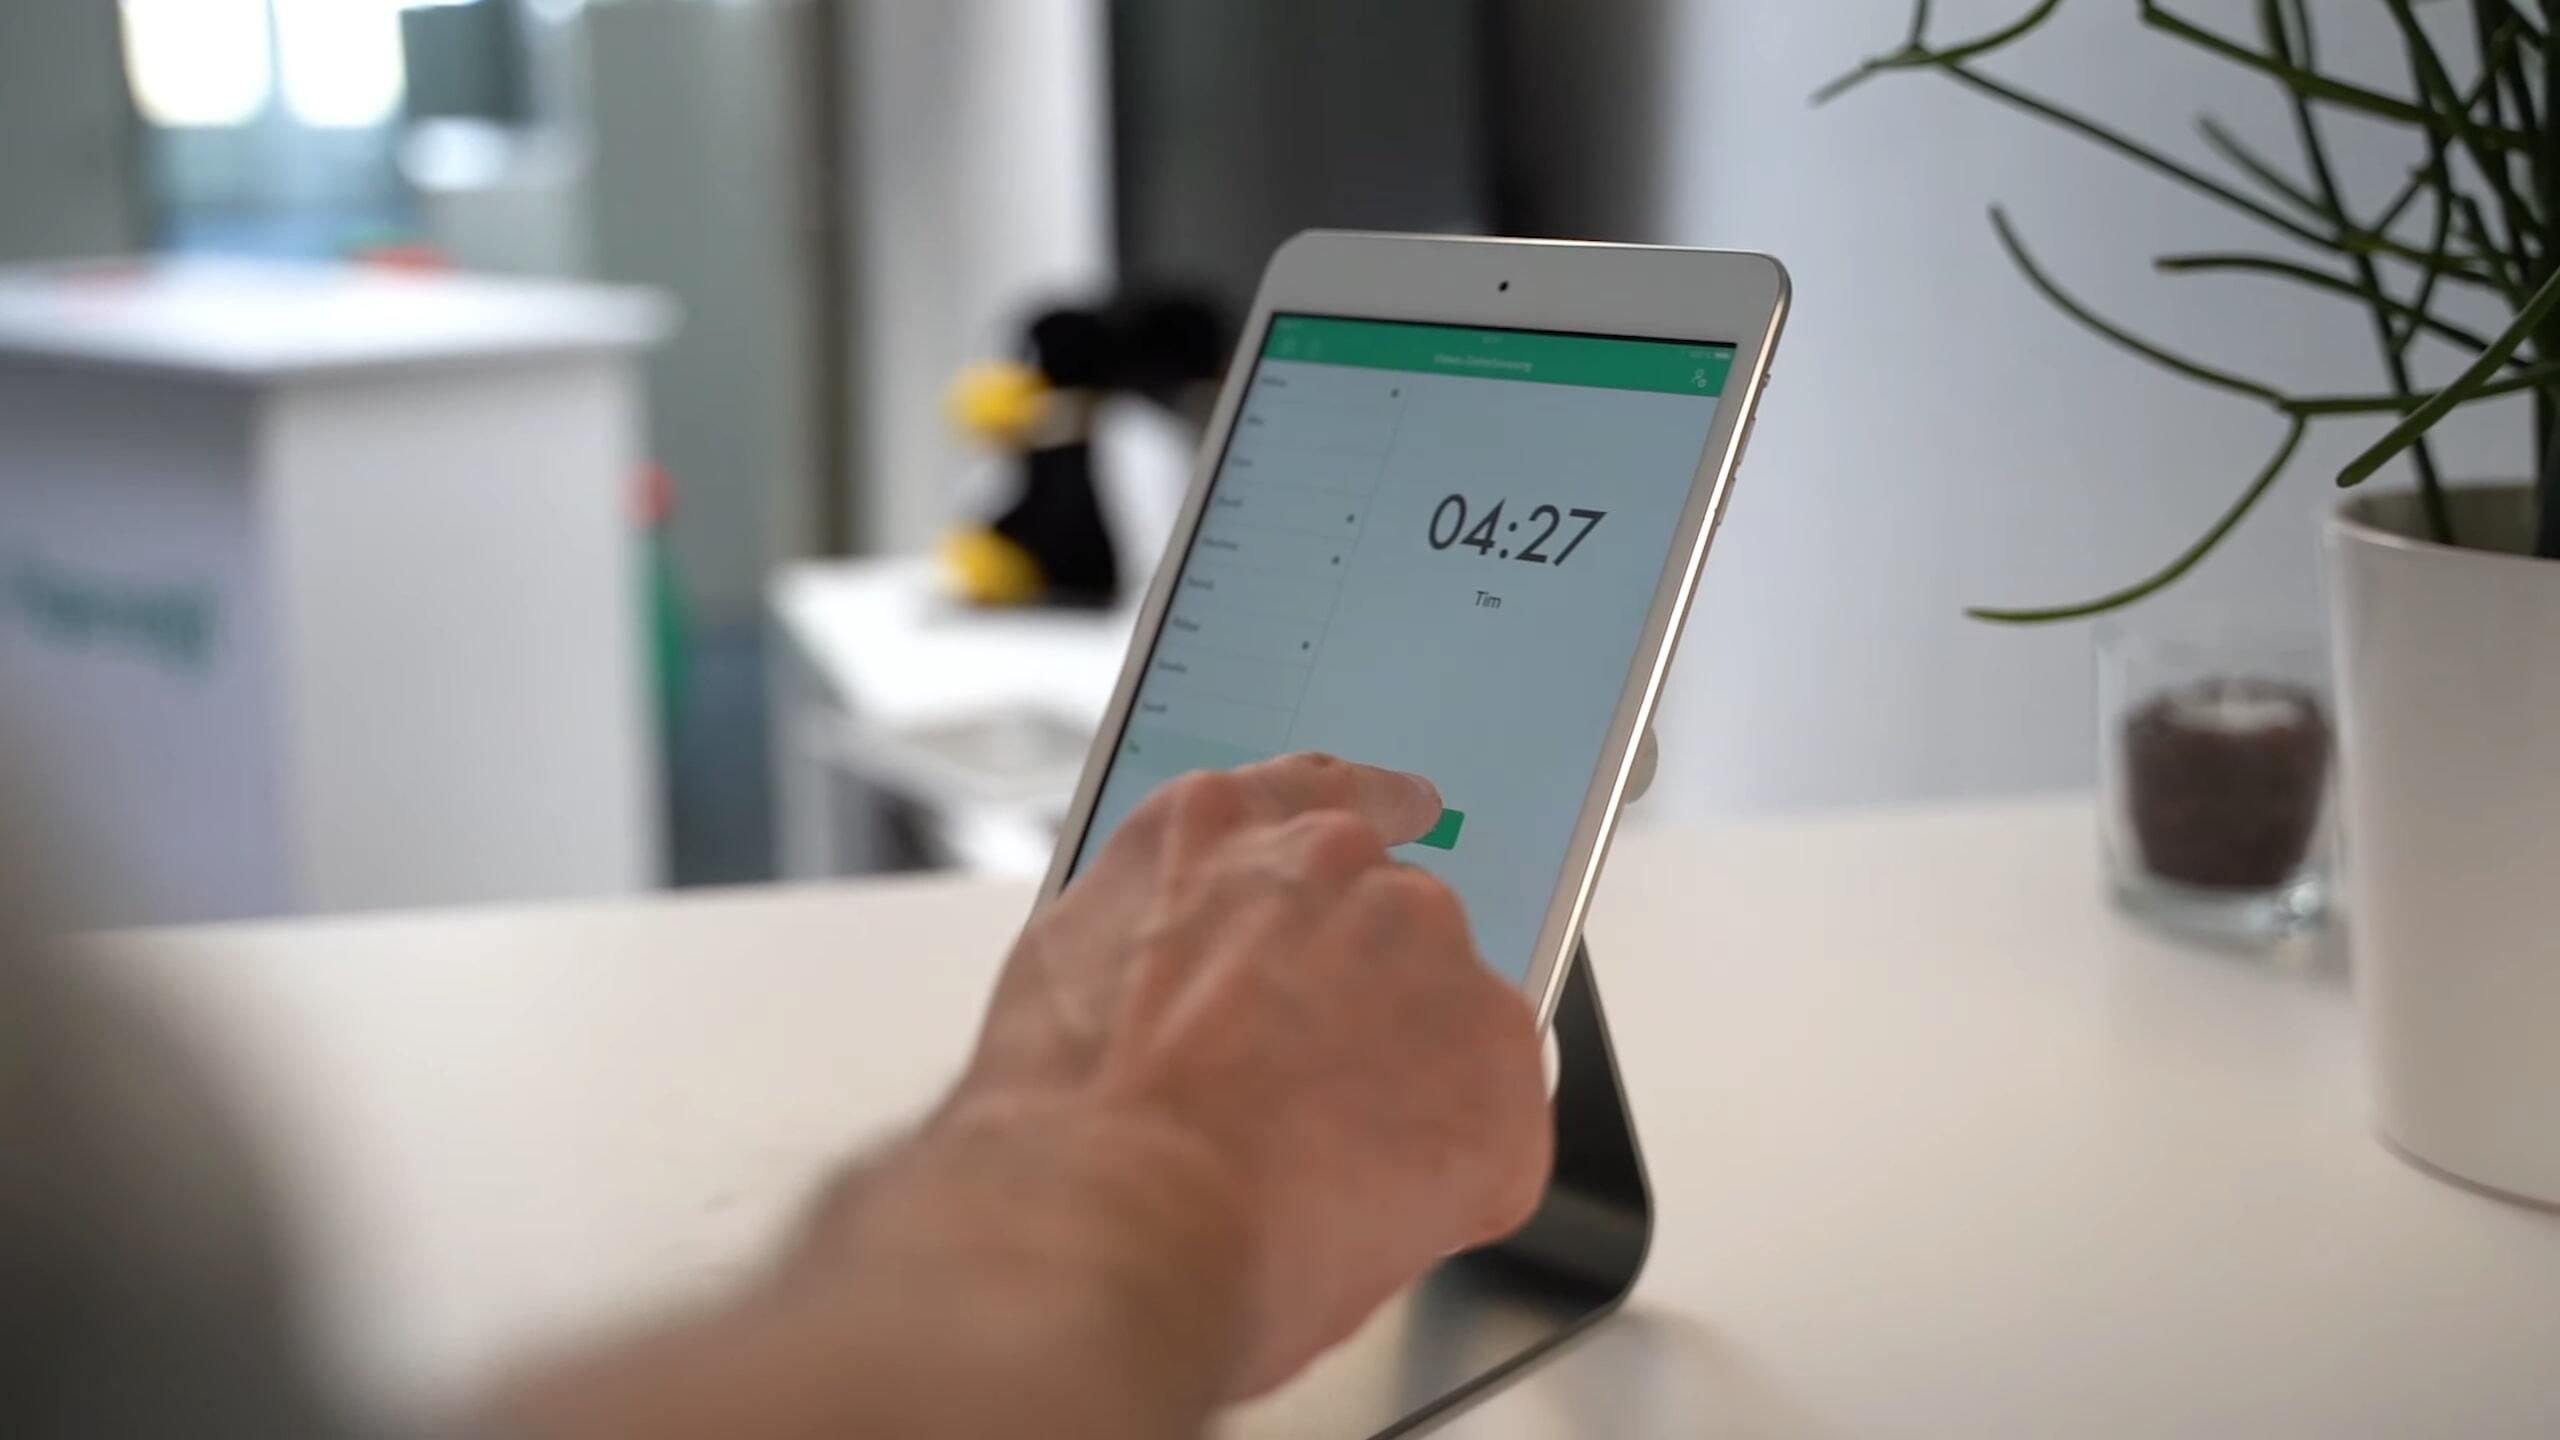 Digitale Zeiterfassung via statioärem Tablet